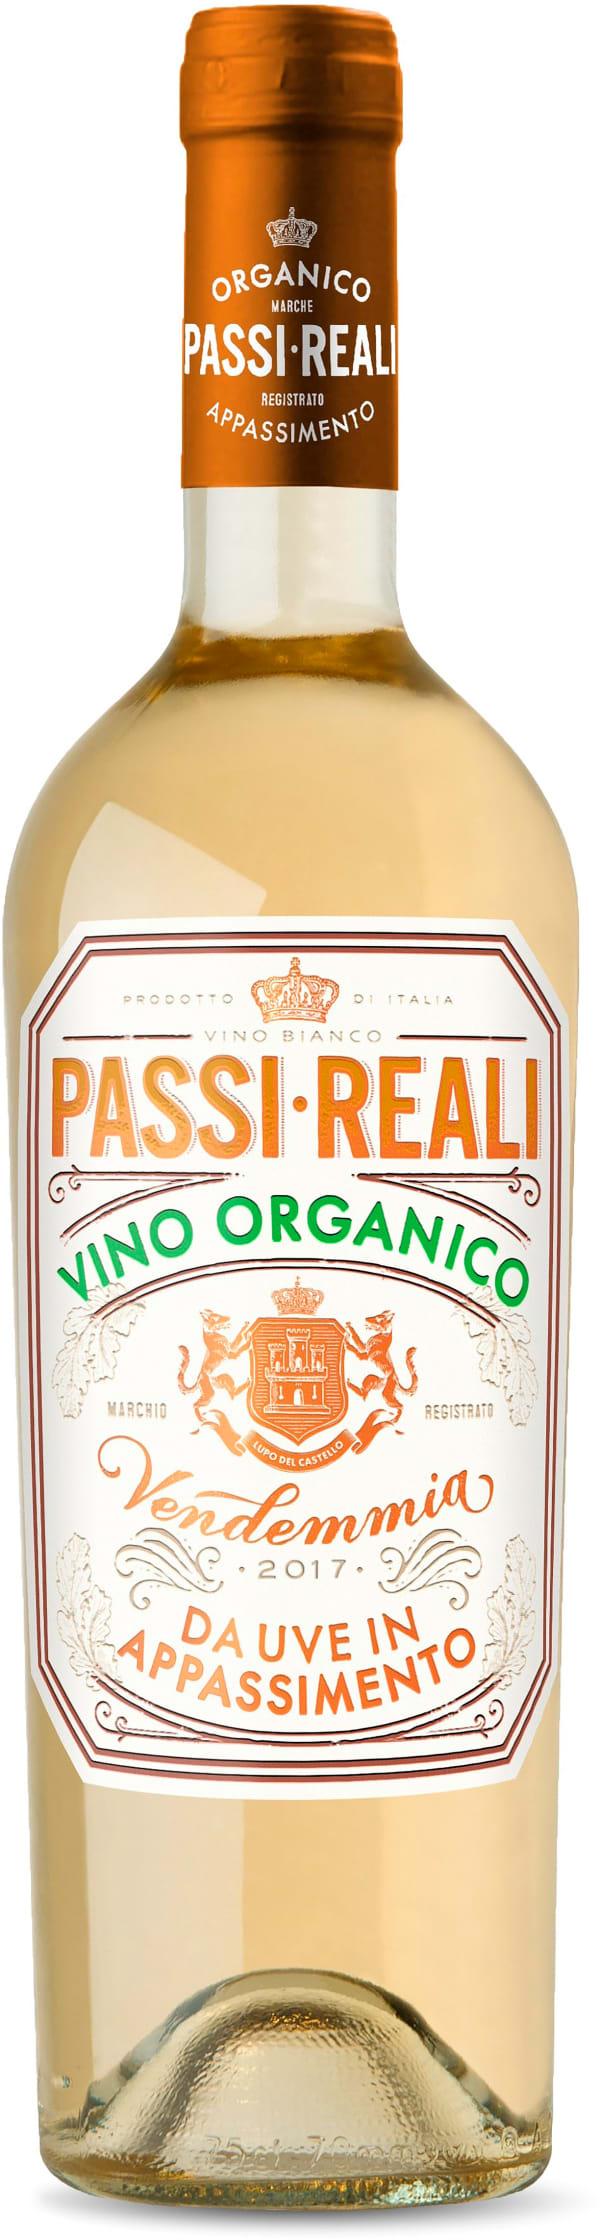 Passi Reali Organico Appassimento Bianco 2019